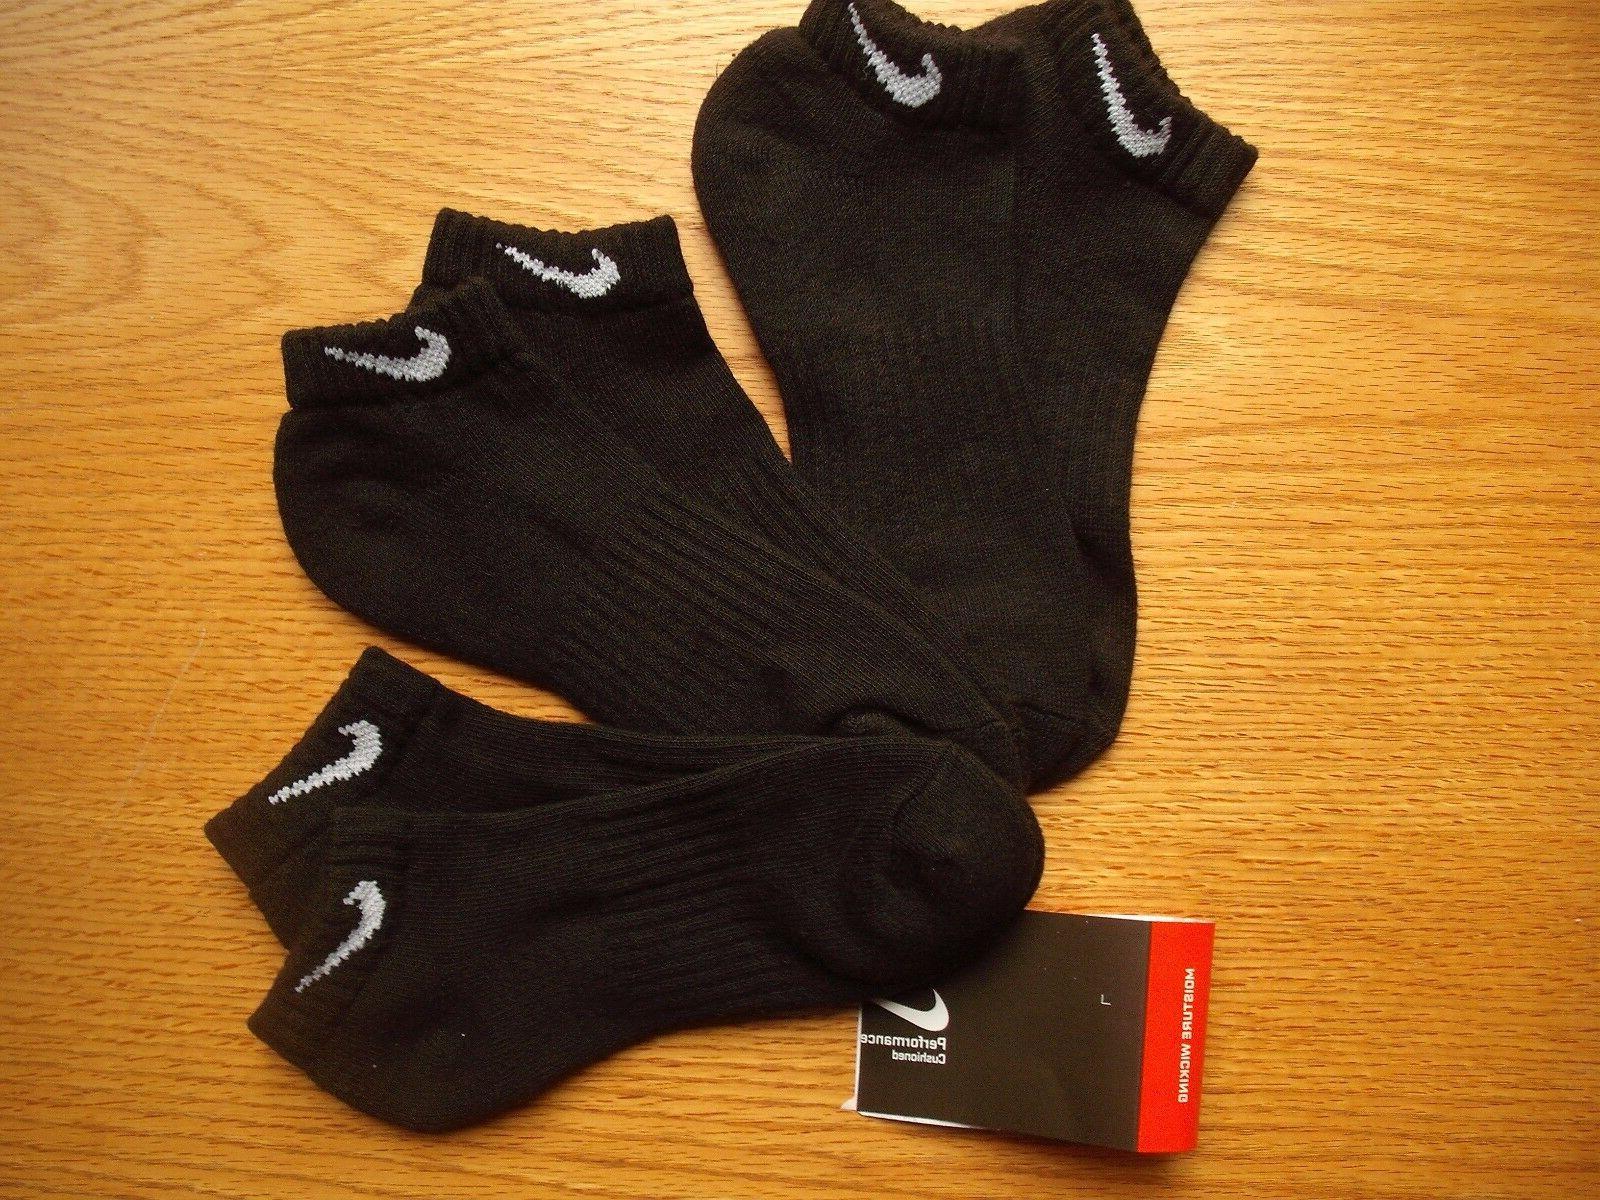 Mens Nike NWT Low-Cut Socks LOW PRICE 3prs Black Authentic S